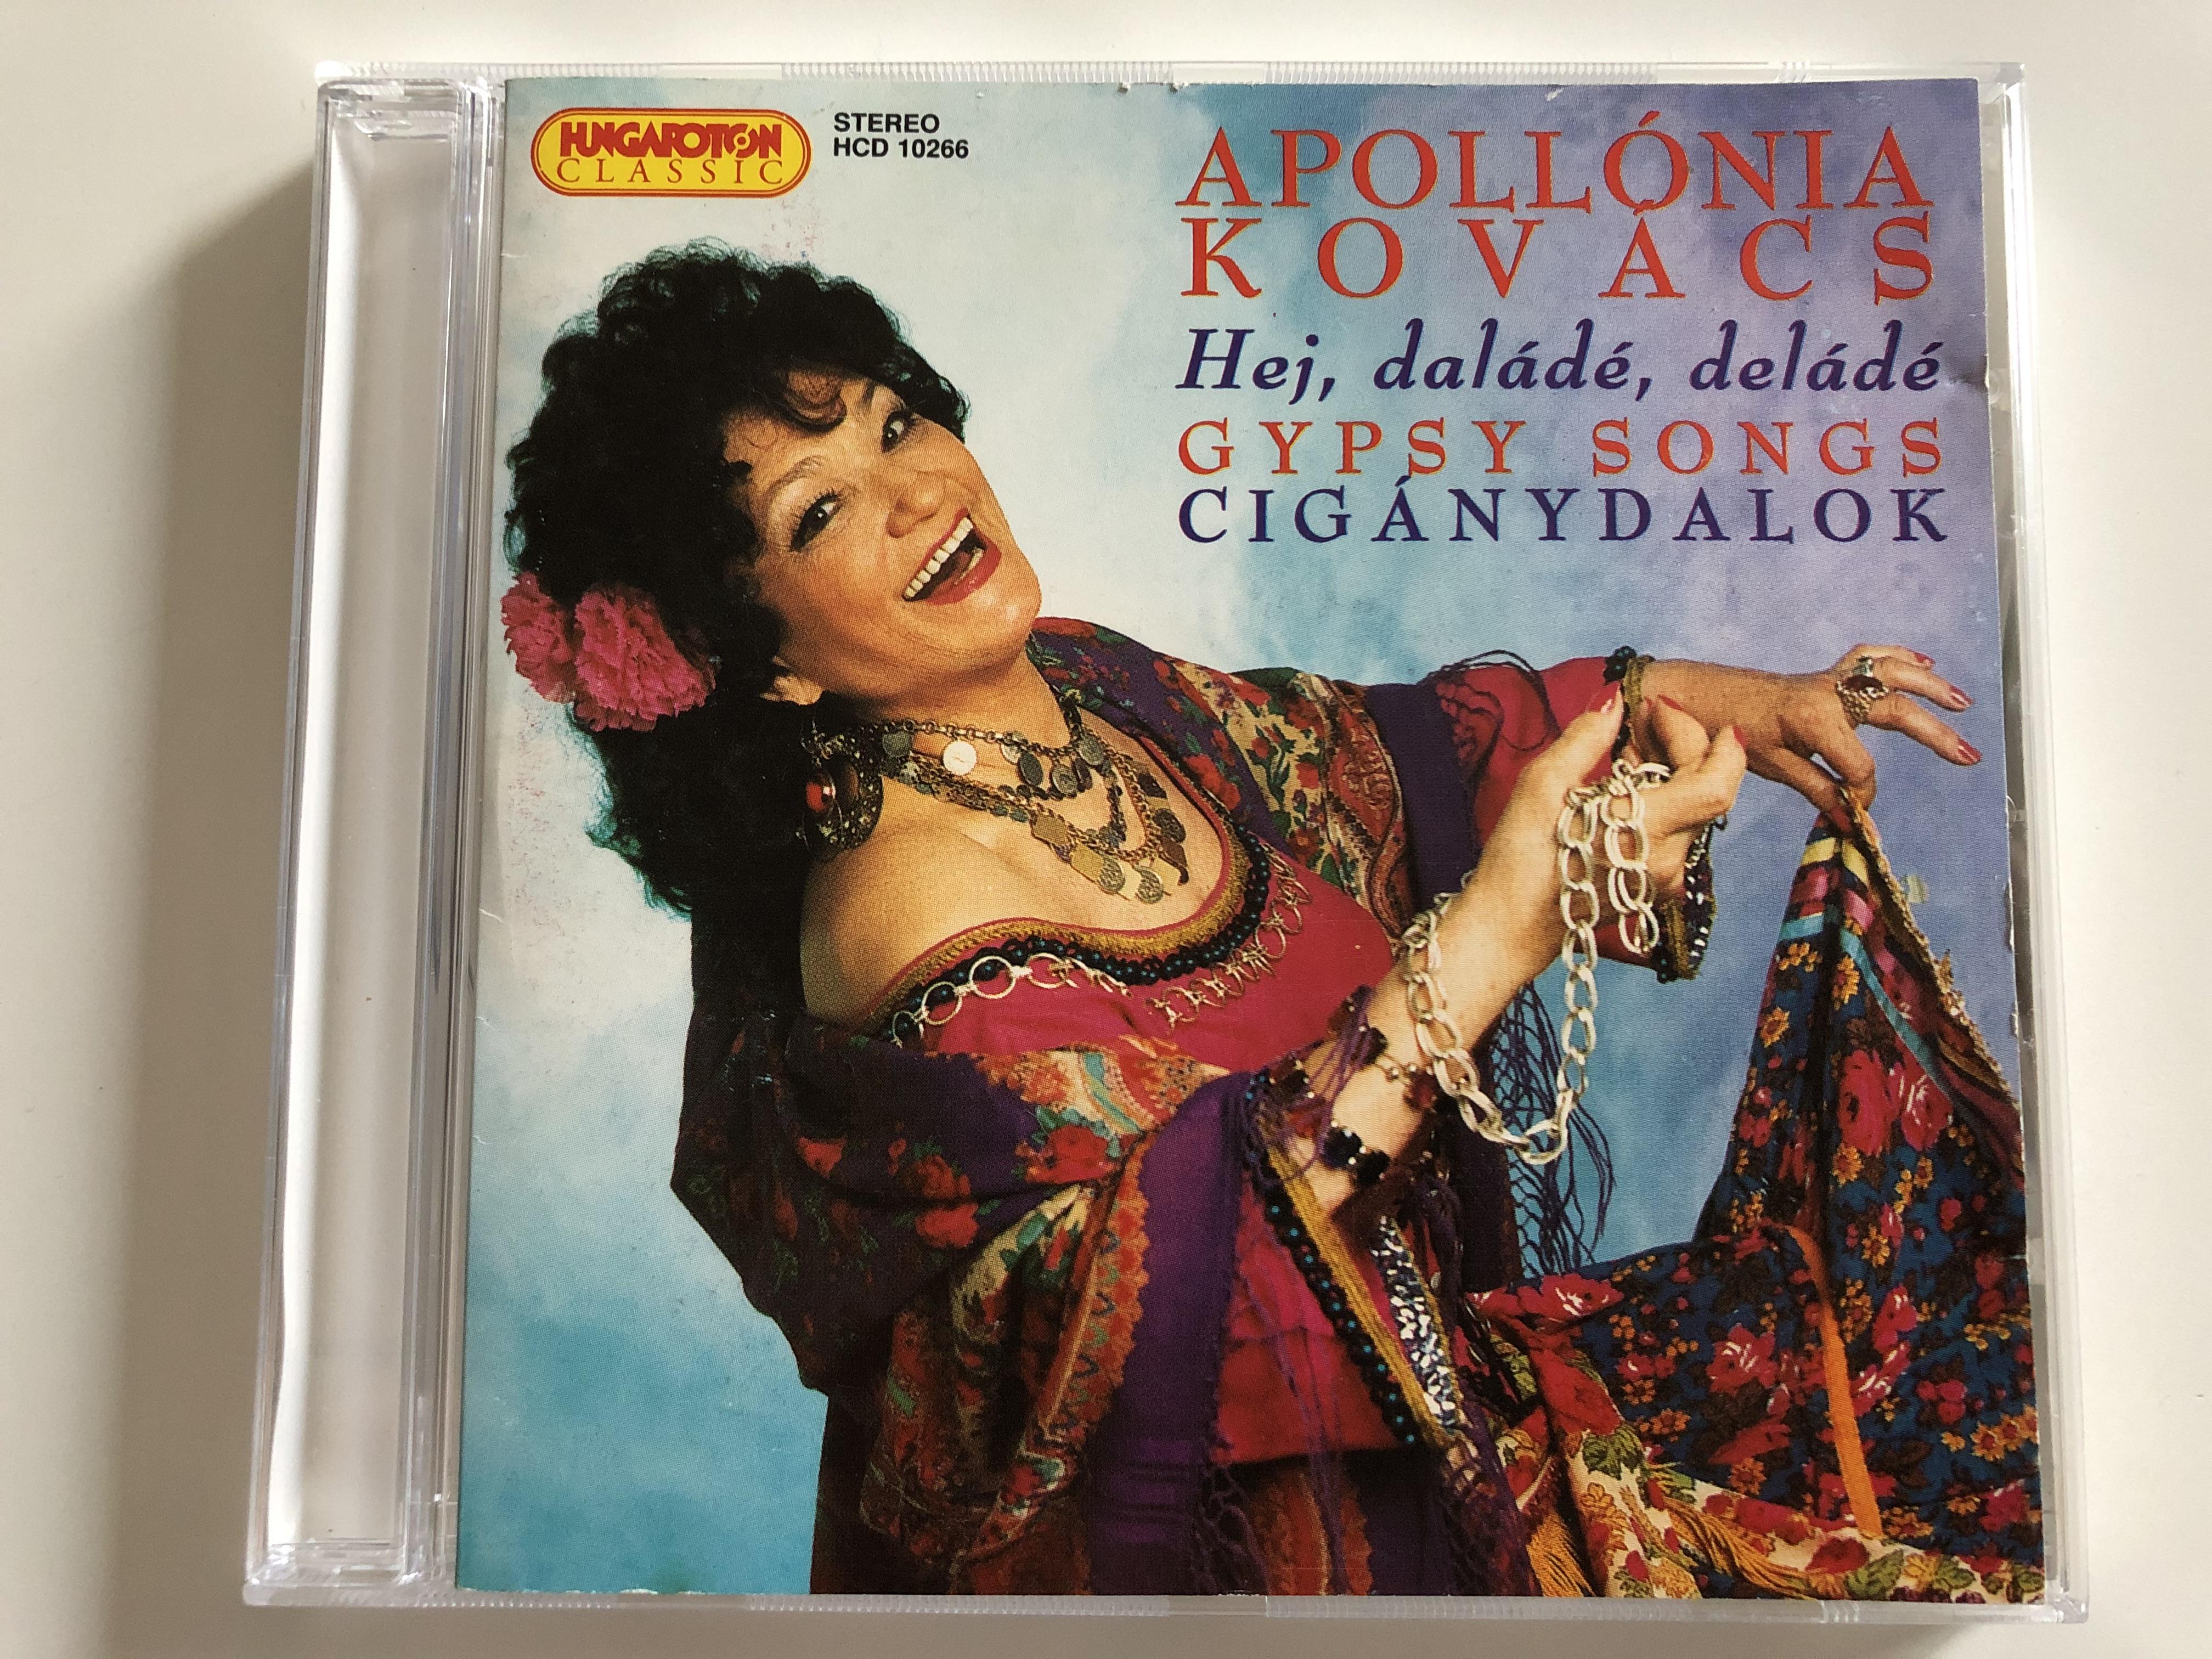 apoll-nia-kov-cs-hej-dal-d-del-d-gypsy-songs-cig-nydalok-hungaroton-classic-audio-cd-1994-hcd-10266-1-.jpg